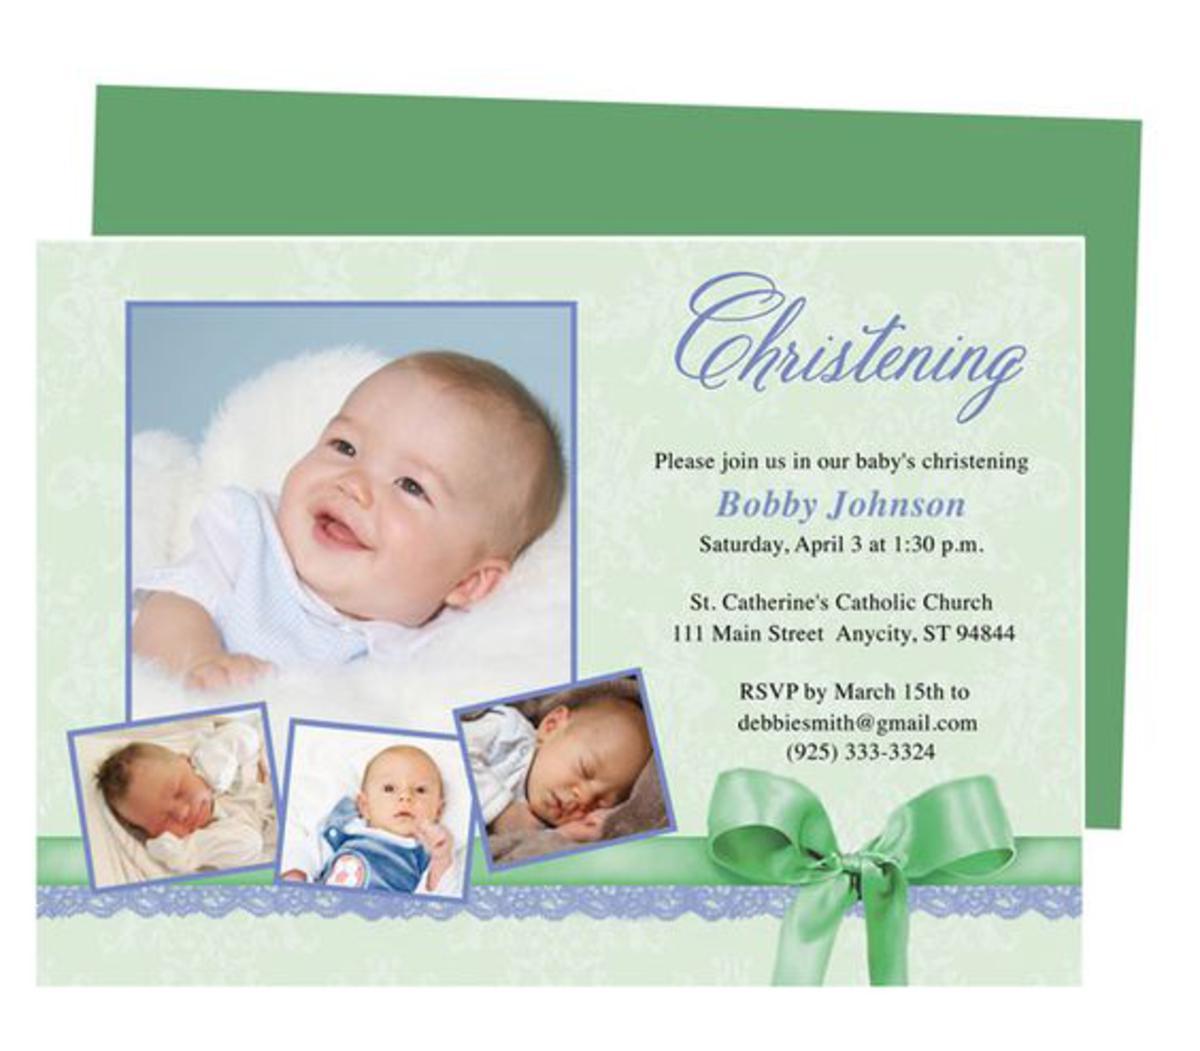 Christening/Baptism Ceremony Invitation Wording